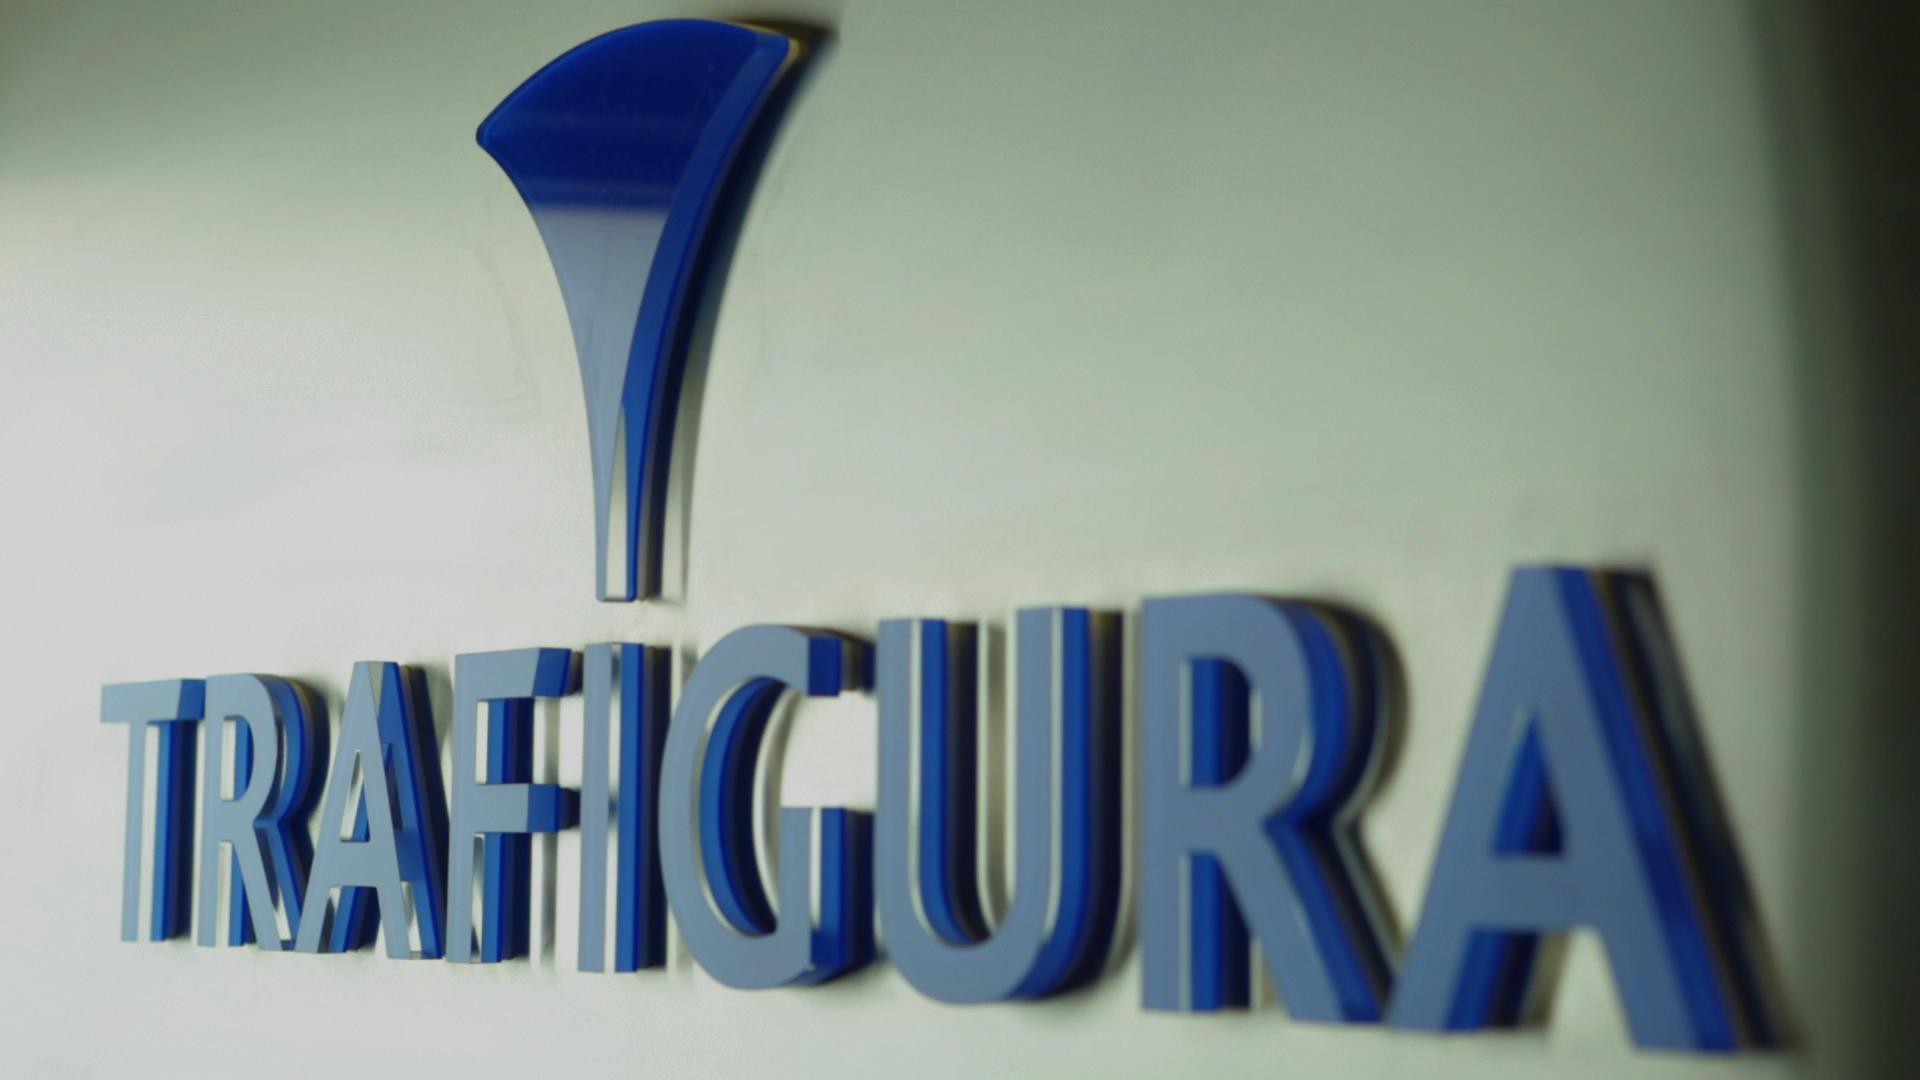 Global Markets: Trafigura Leads The U S  Oil Export Boom